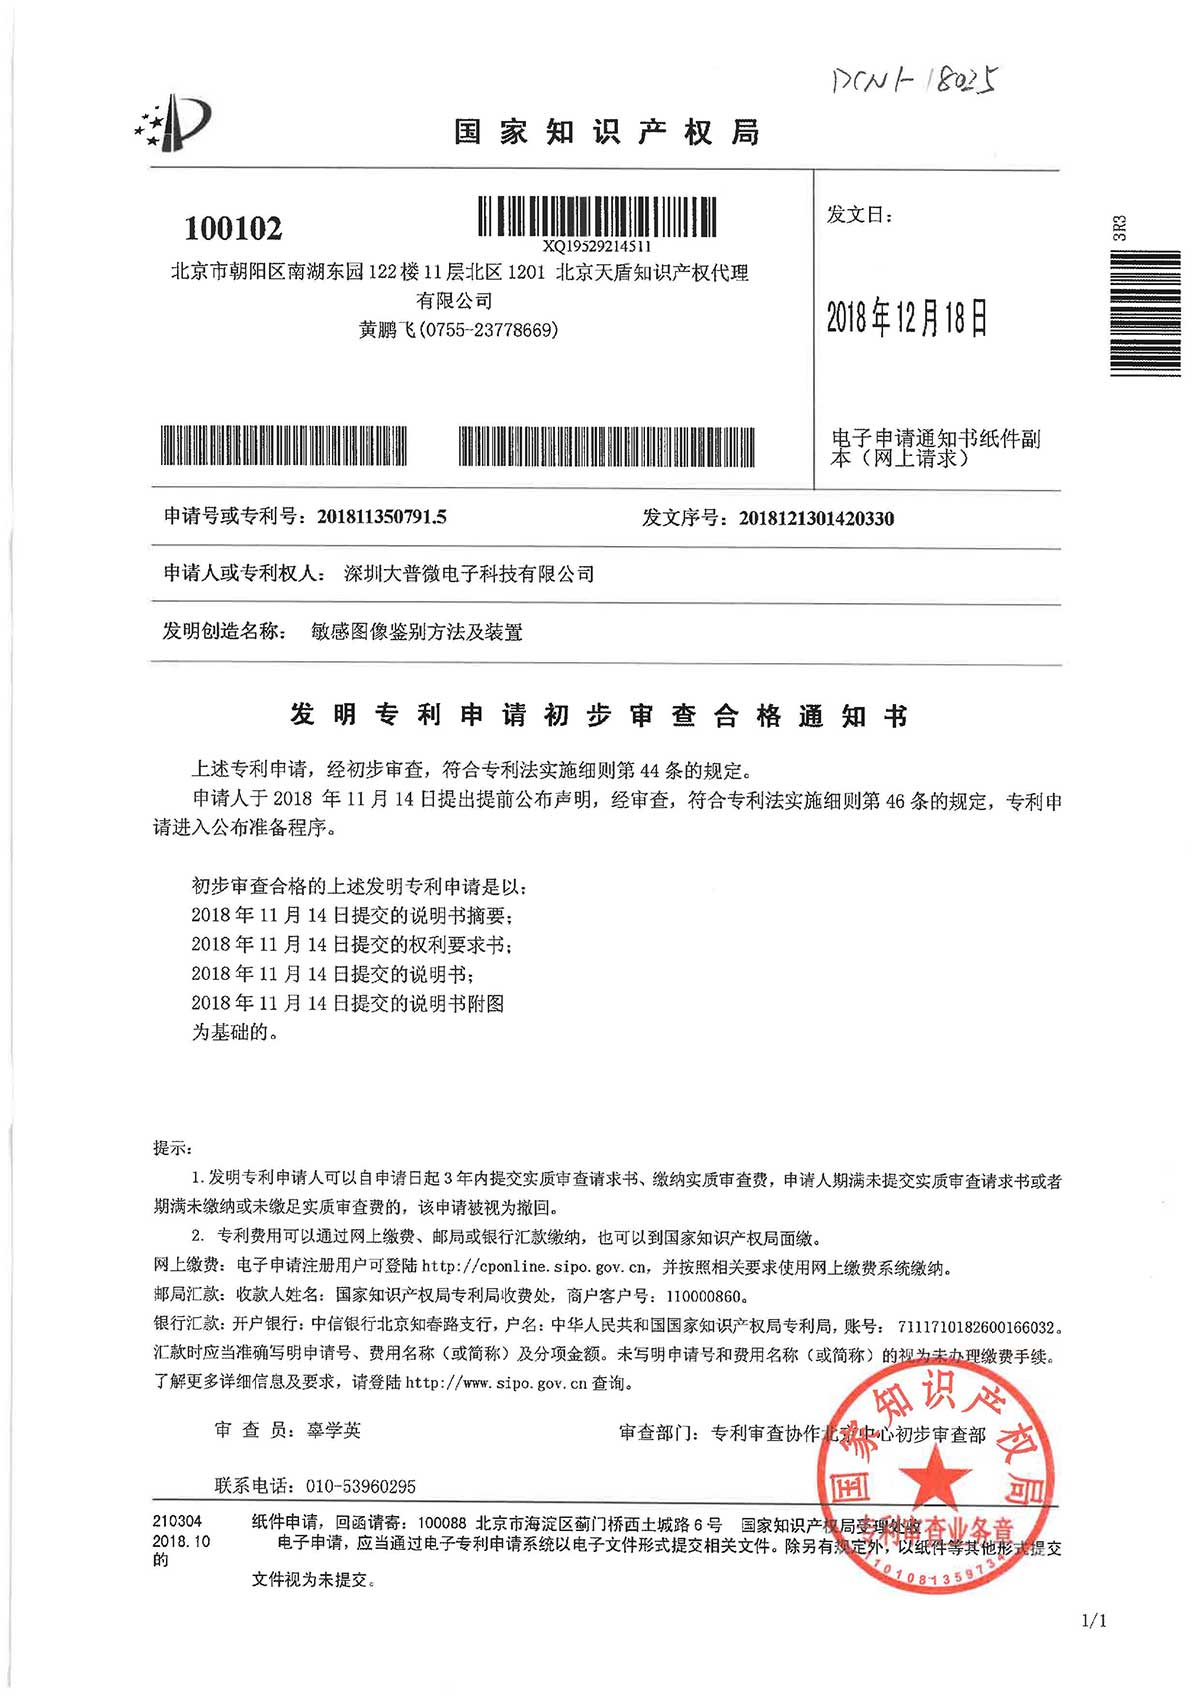 DCN1-18025 存储中影片或图片敏感性内容之搜索 初审合格